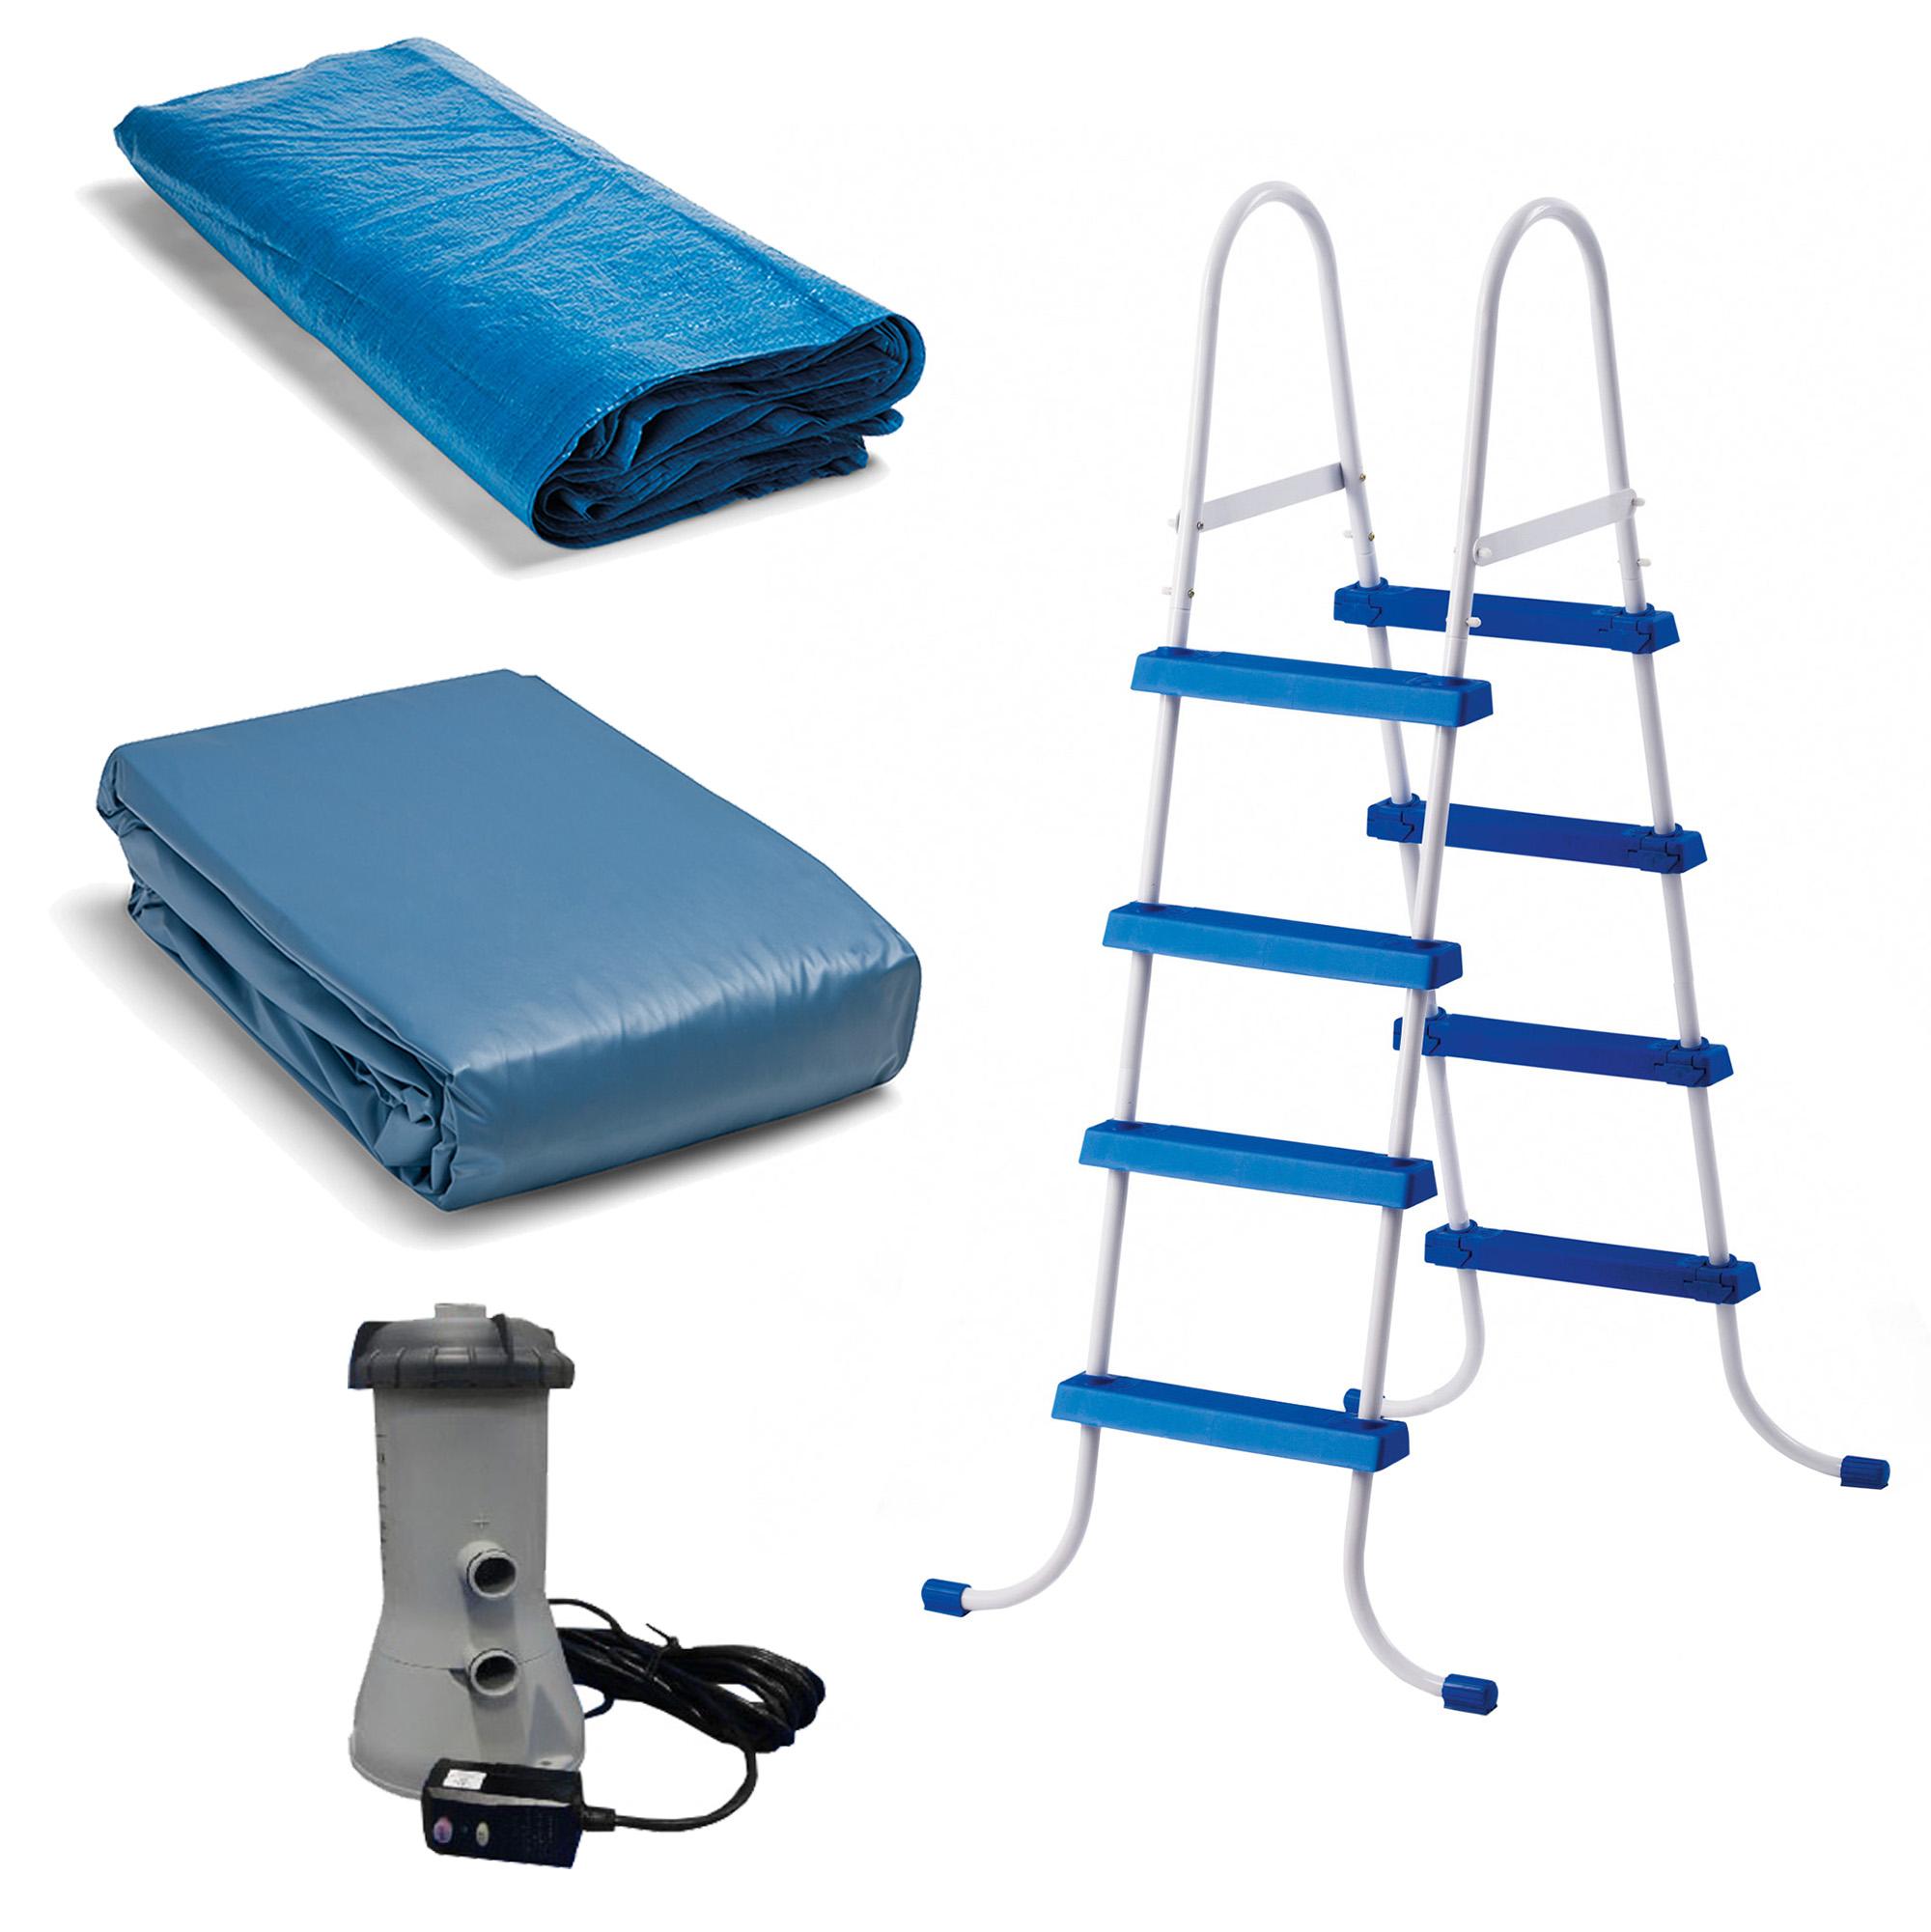 Intex 15 39 X 48 Easy Set Swimming Pool Kit W 1000 Gph Gfci Filter Pump 26167eh Ebay